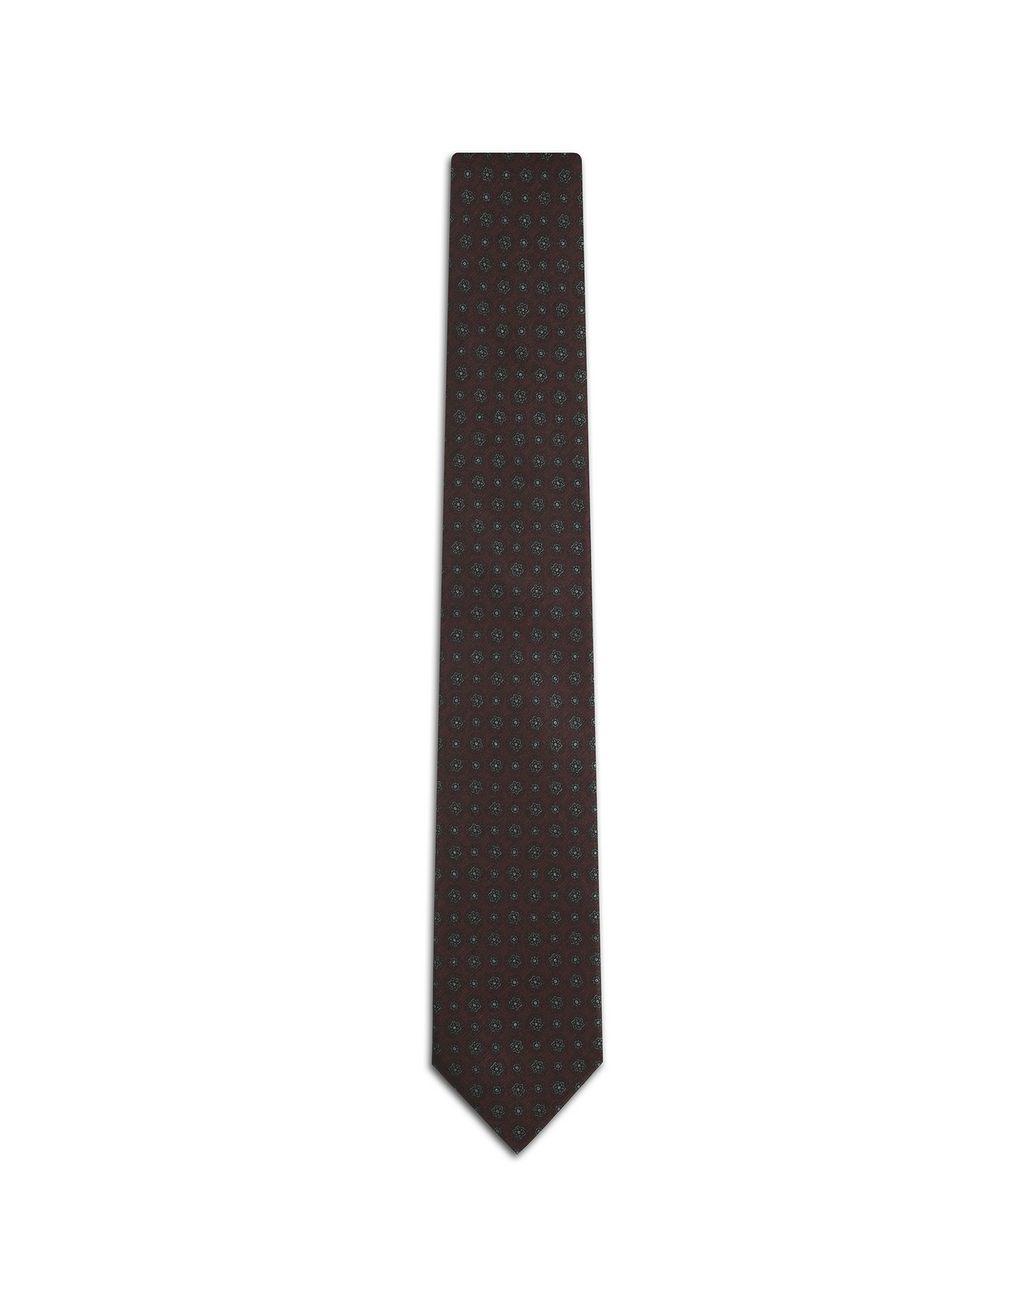 BRIONI Krawatte in der Farbe Amaranth mit großem Muster Krawatte [*** pickupInStoreShippingNotGuaranteed_info ***] f